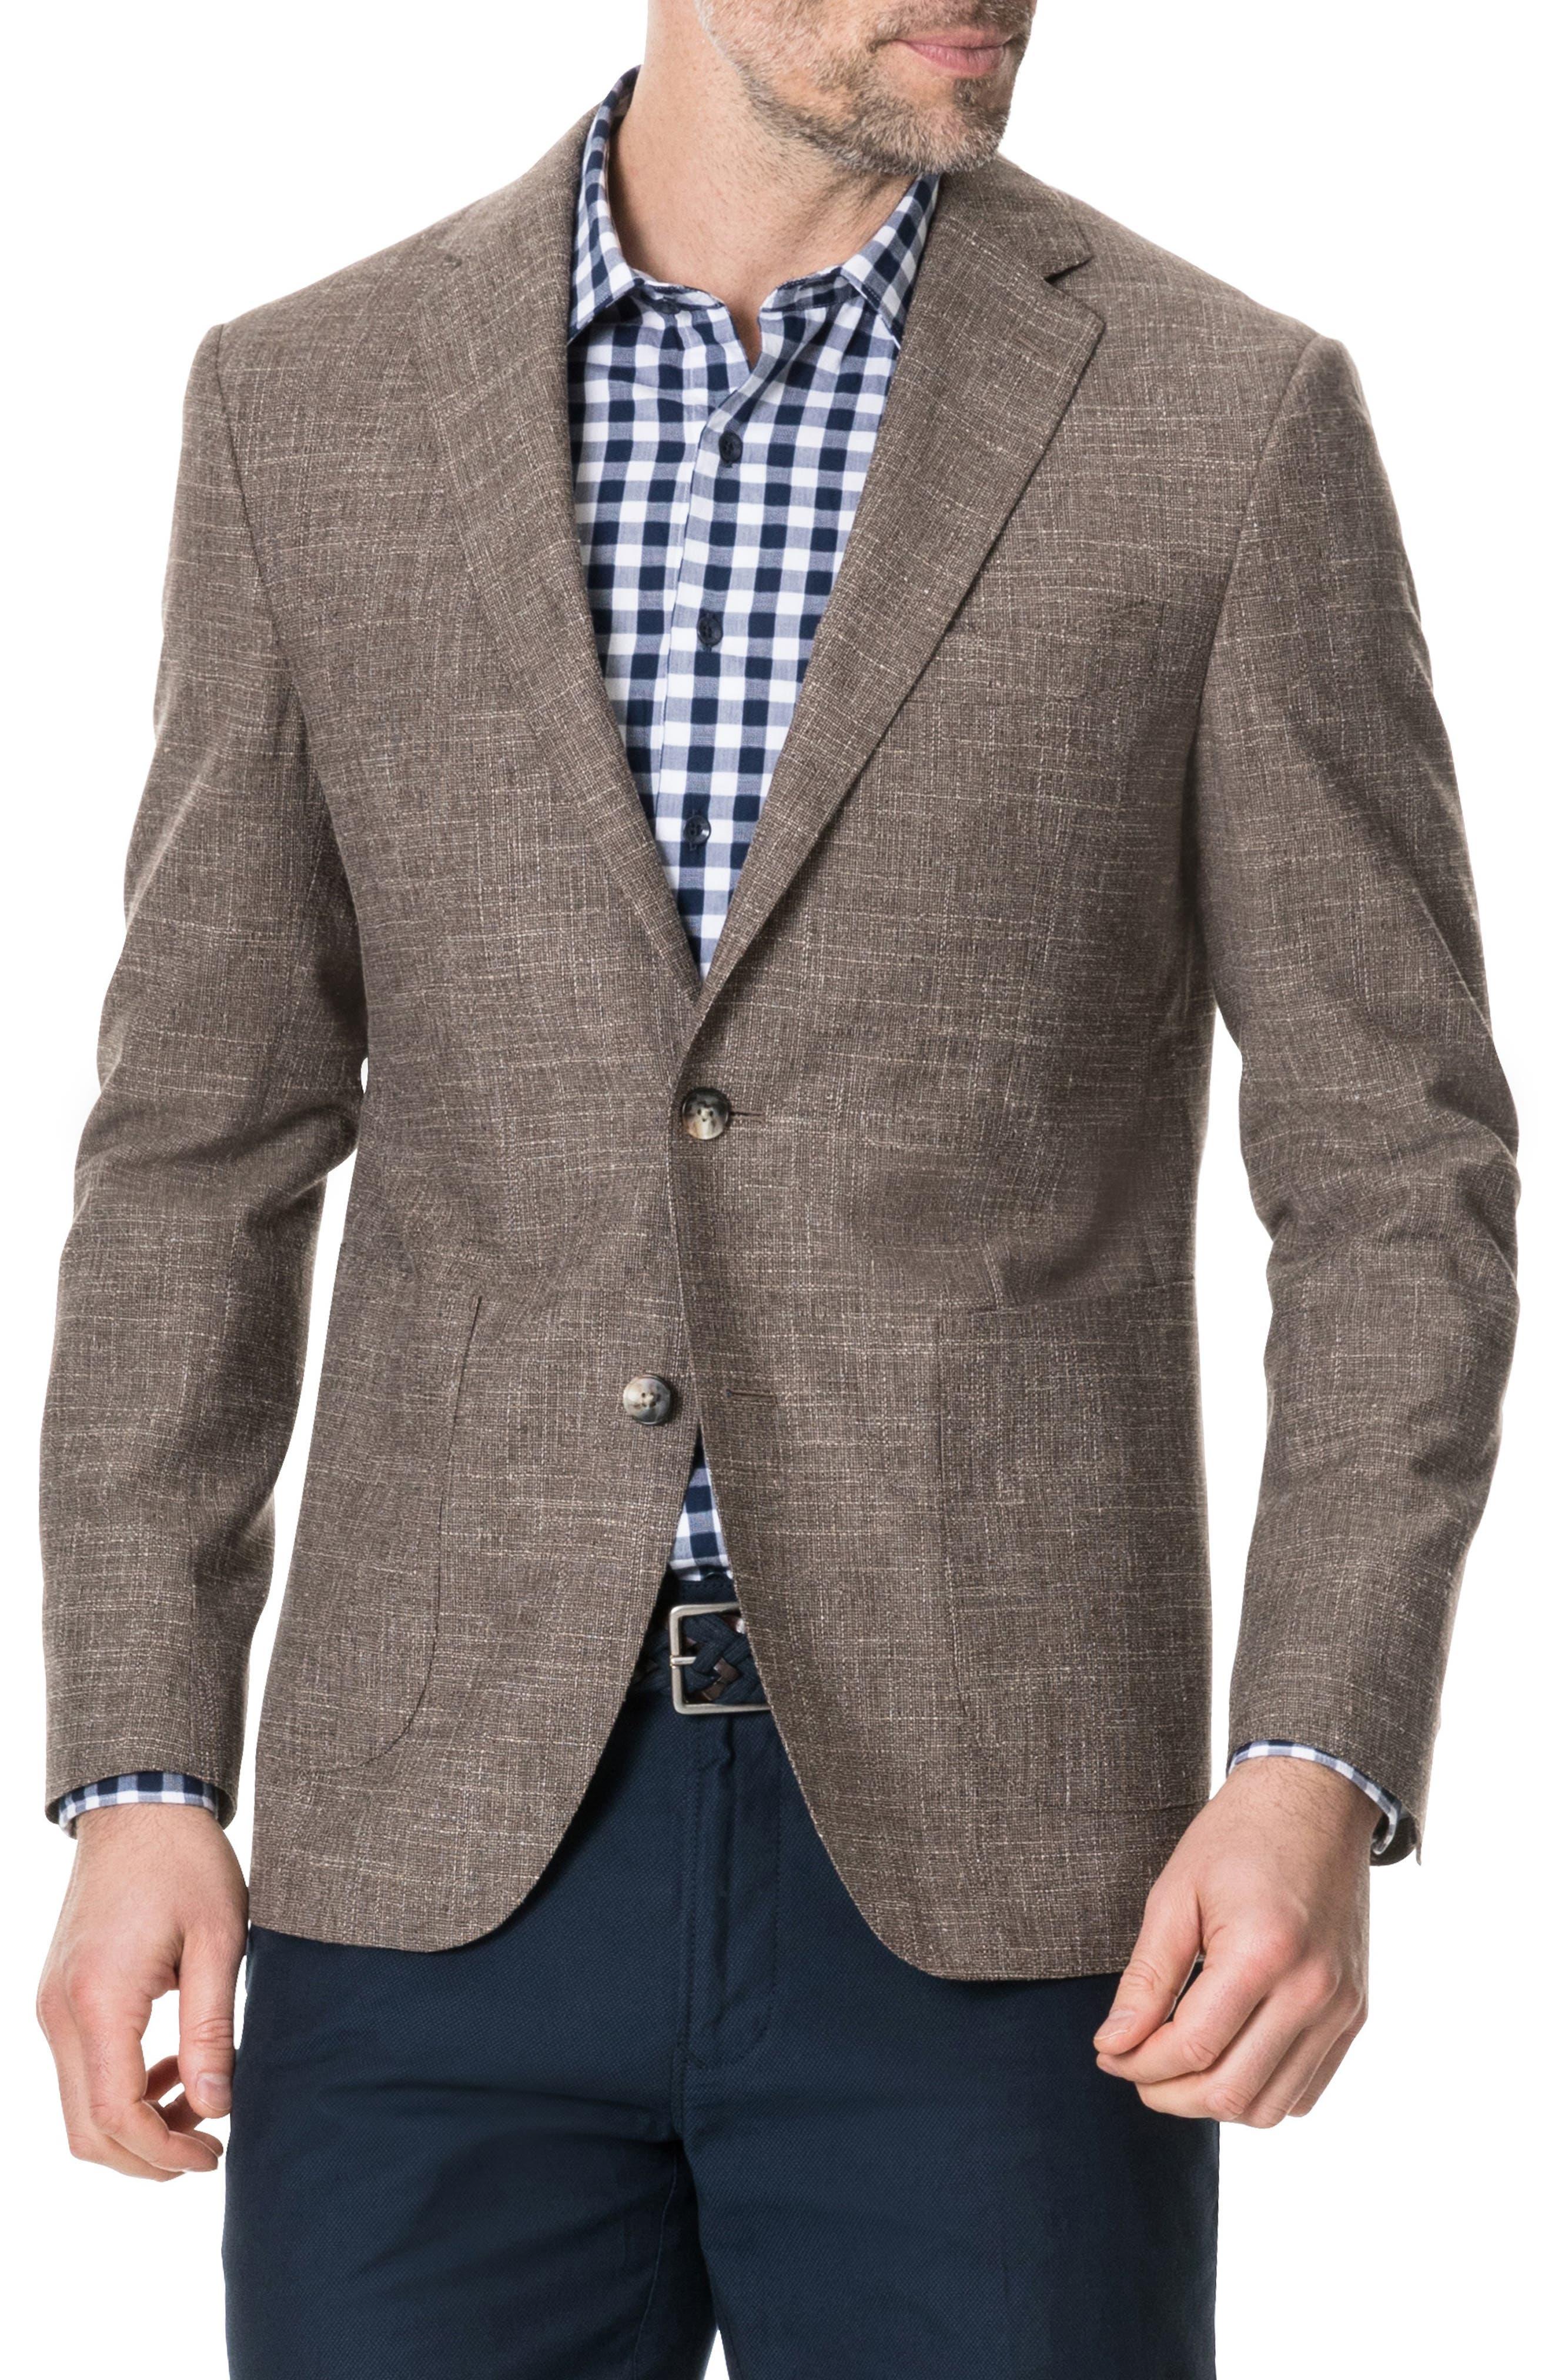 Image of RODD AND GUNN Bringham Creek Regular Fit Jacket